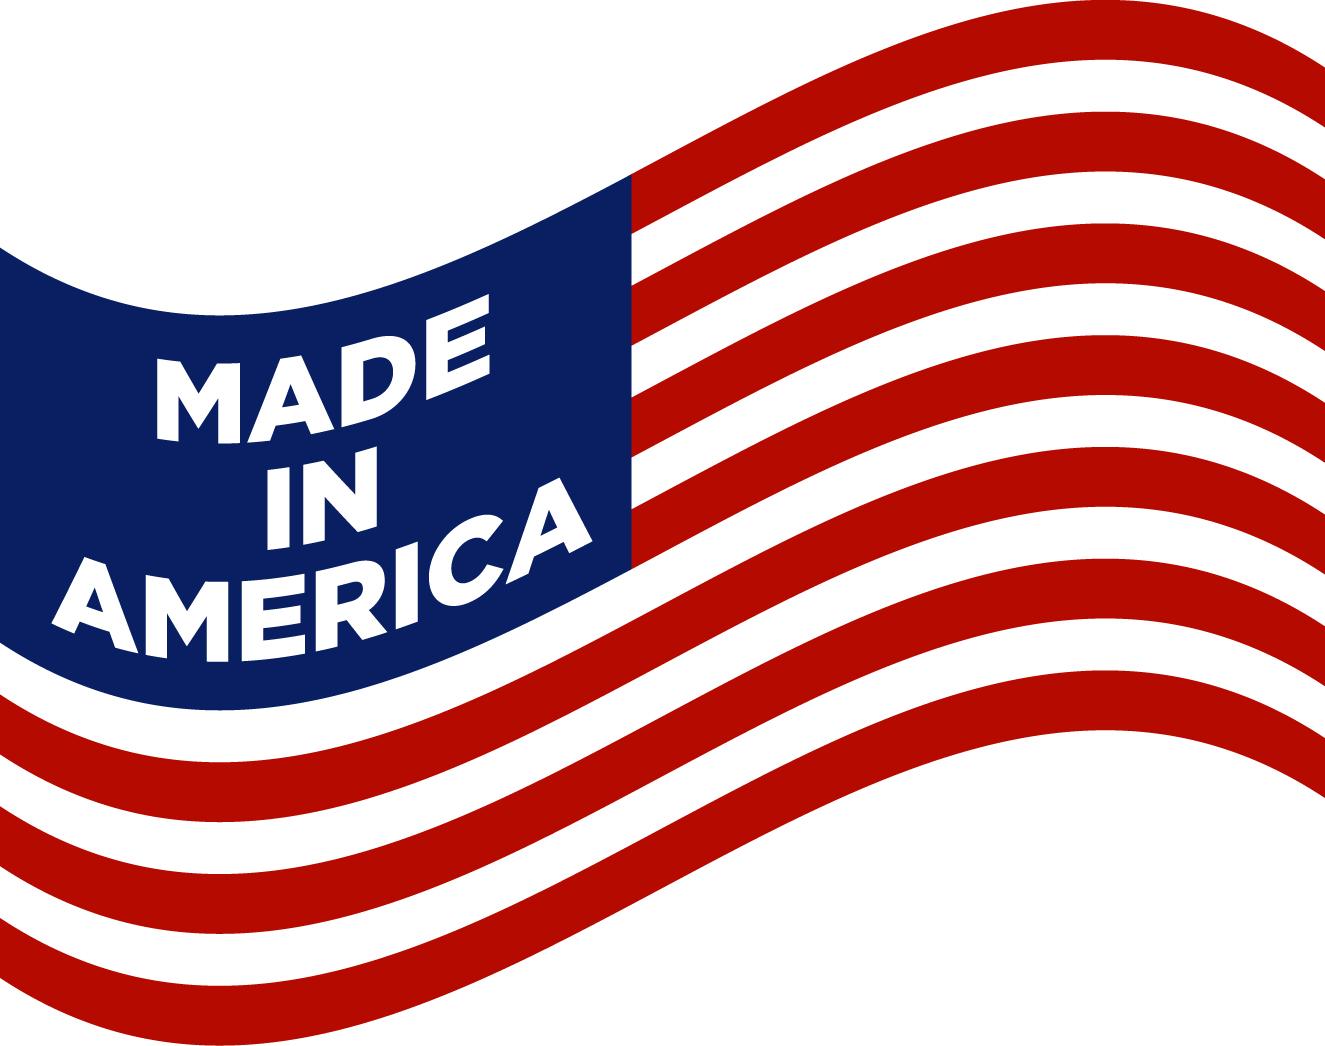 1325x1046 American Flags Clip Art 1 Usa American Clipart